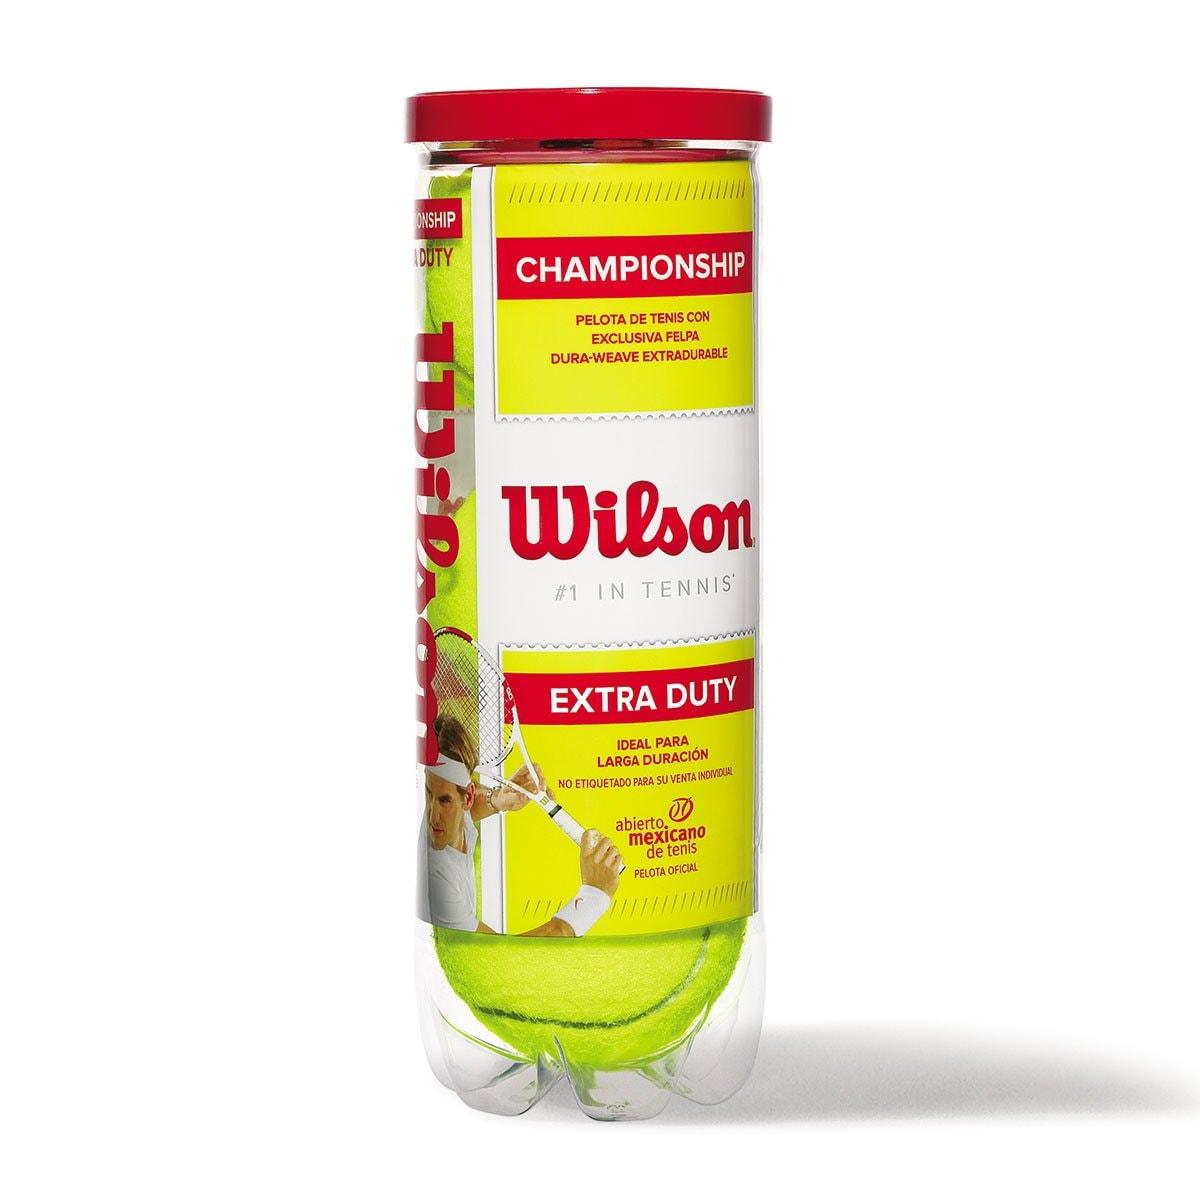 Pelotas de Tenis Nivel Del Mar Wilson